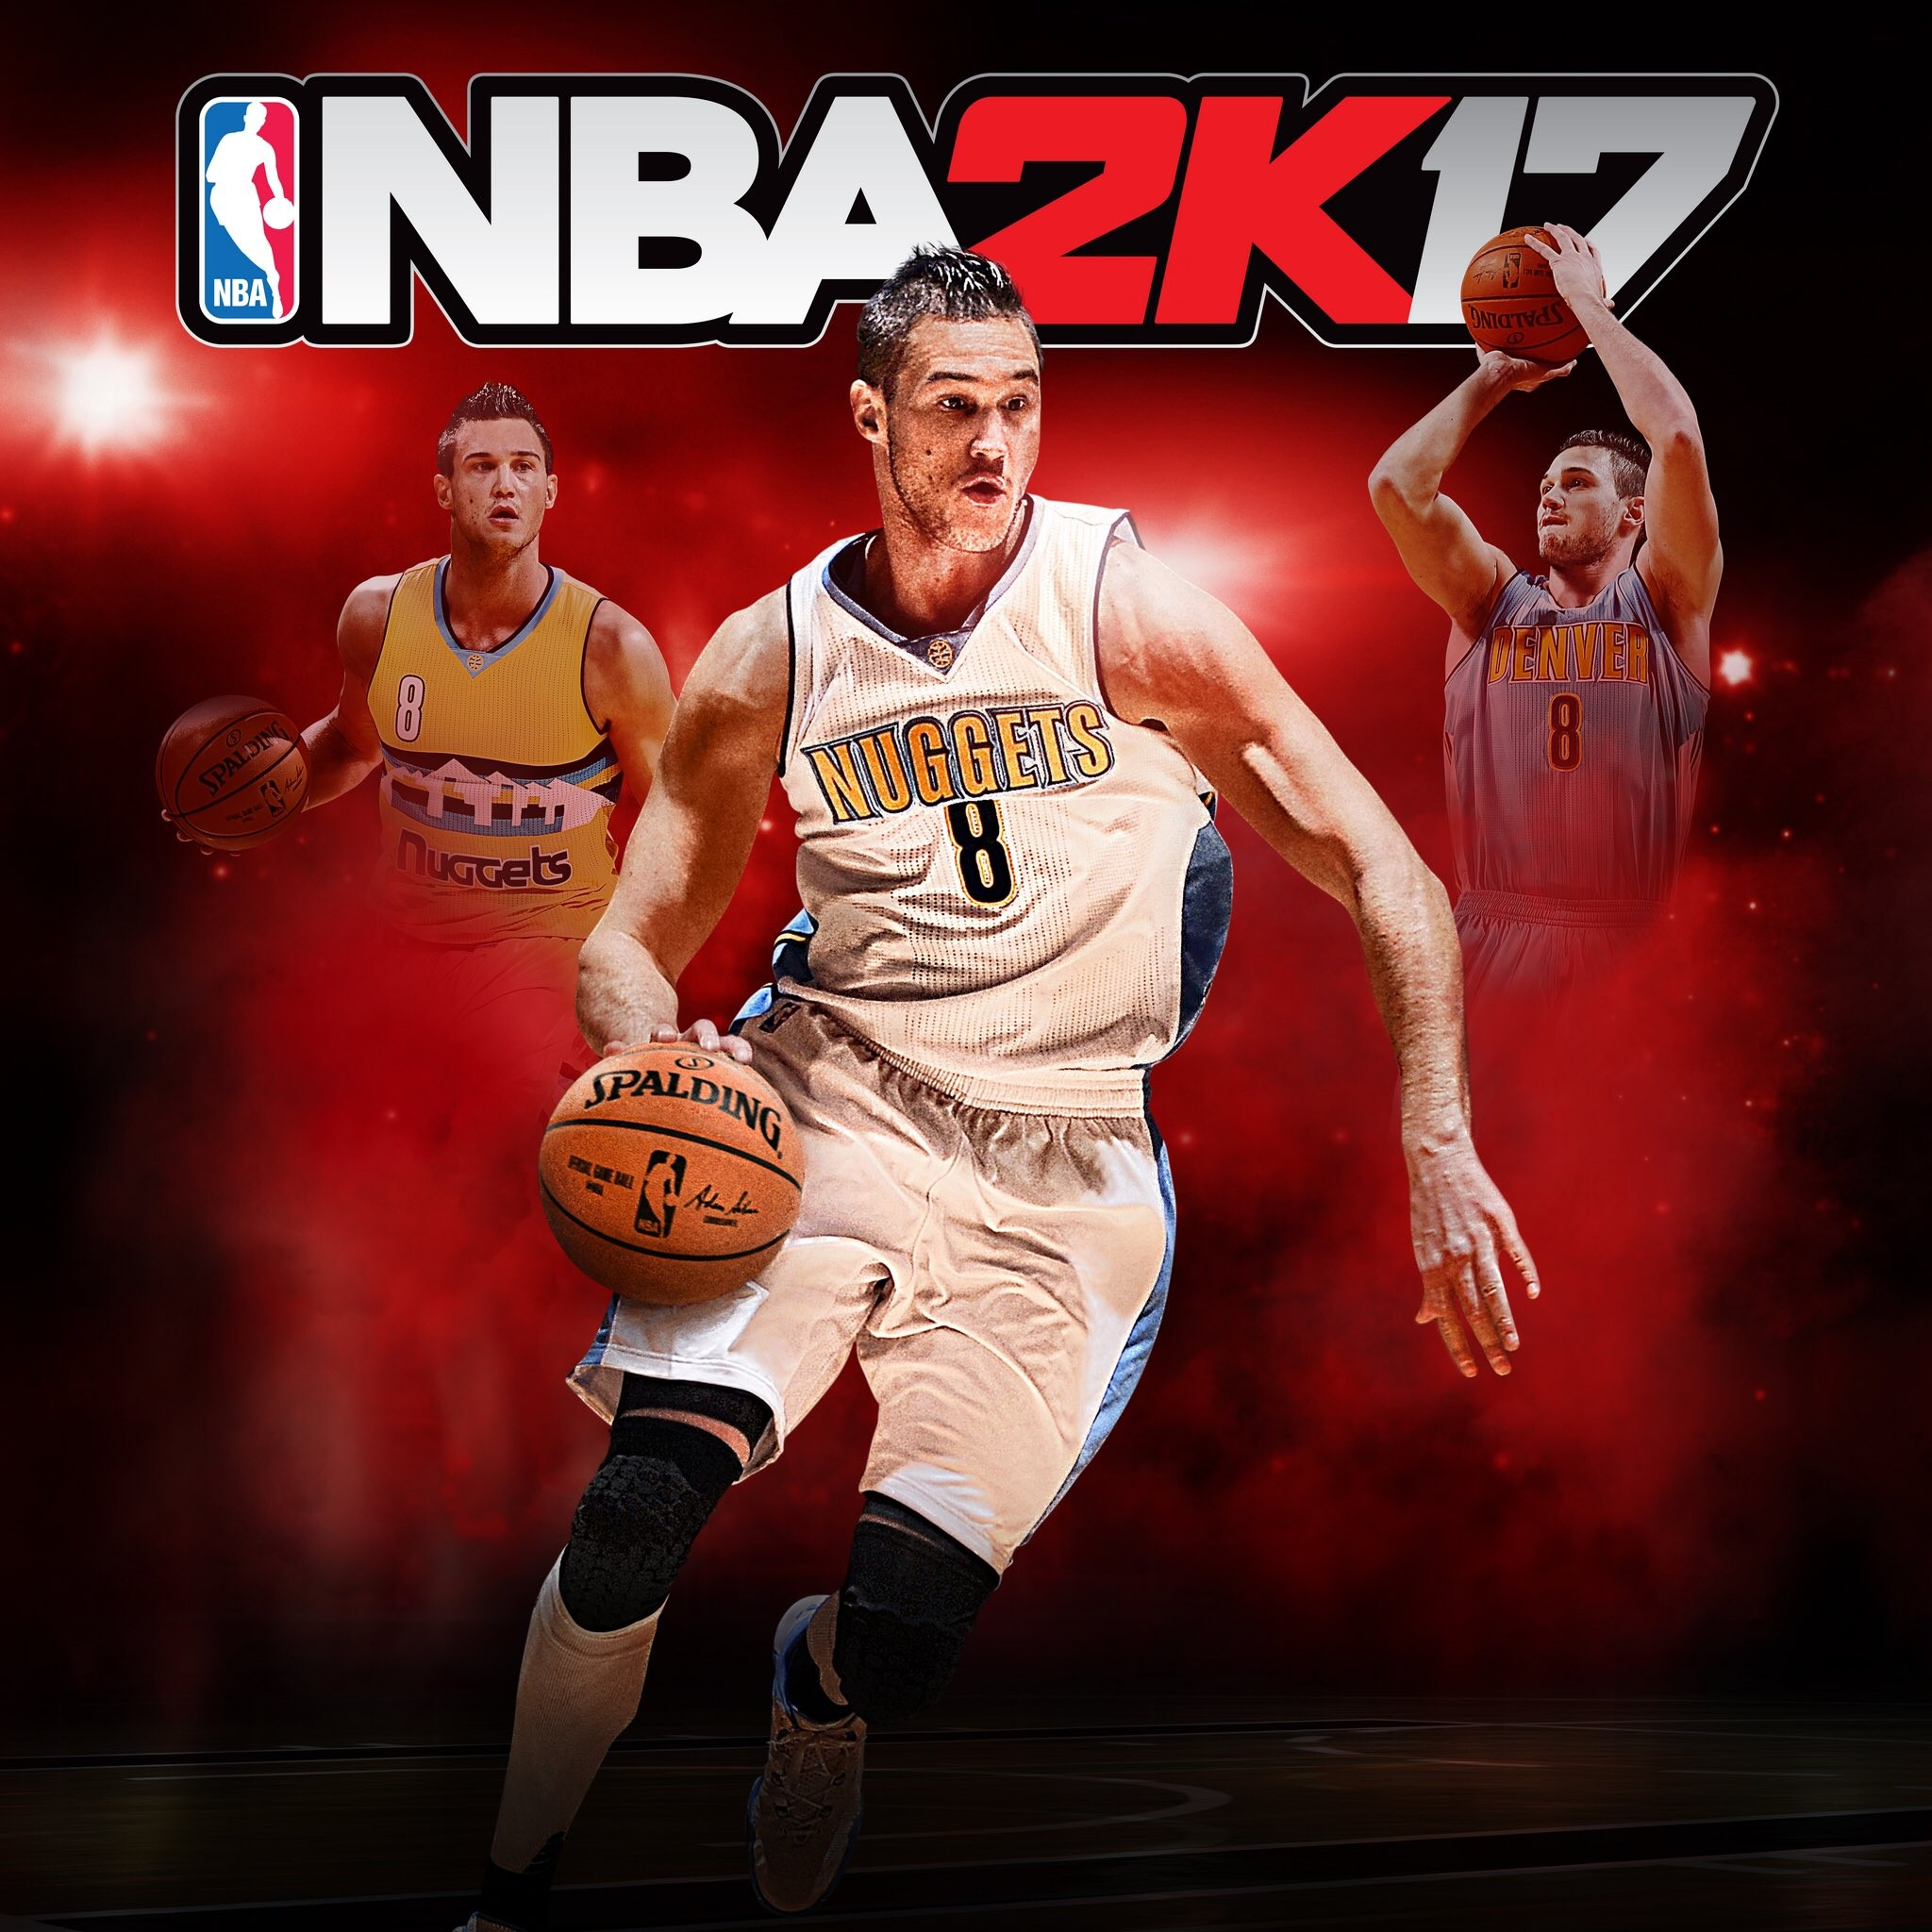 Nba: NBA 2K17 Screenshot #9 For PS4